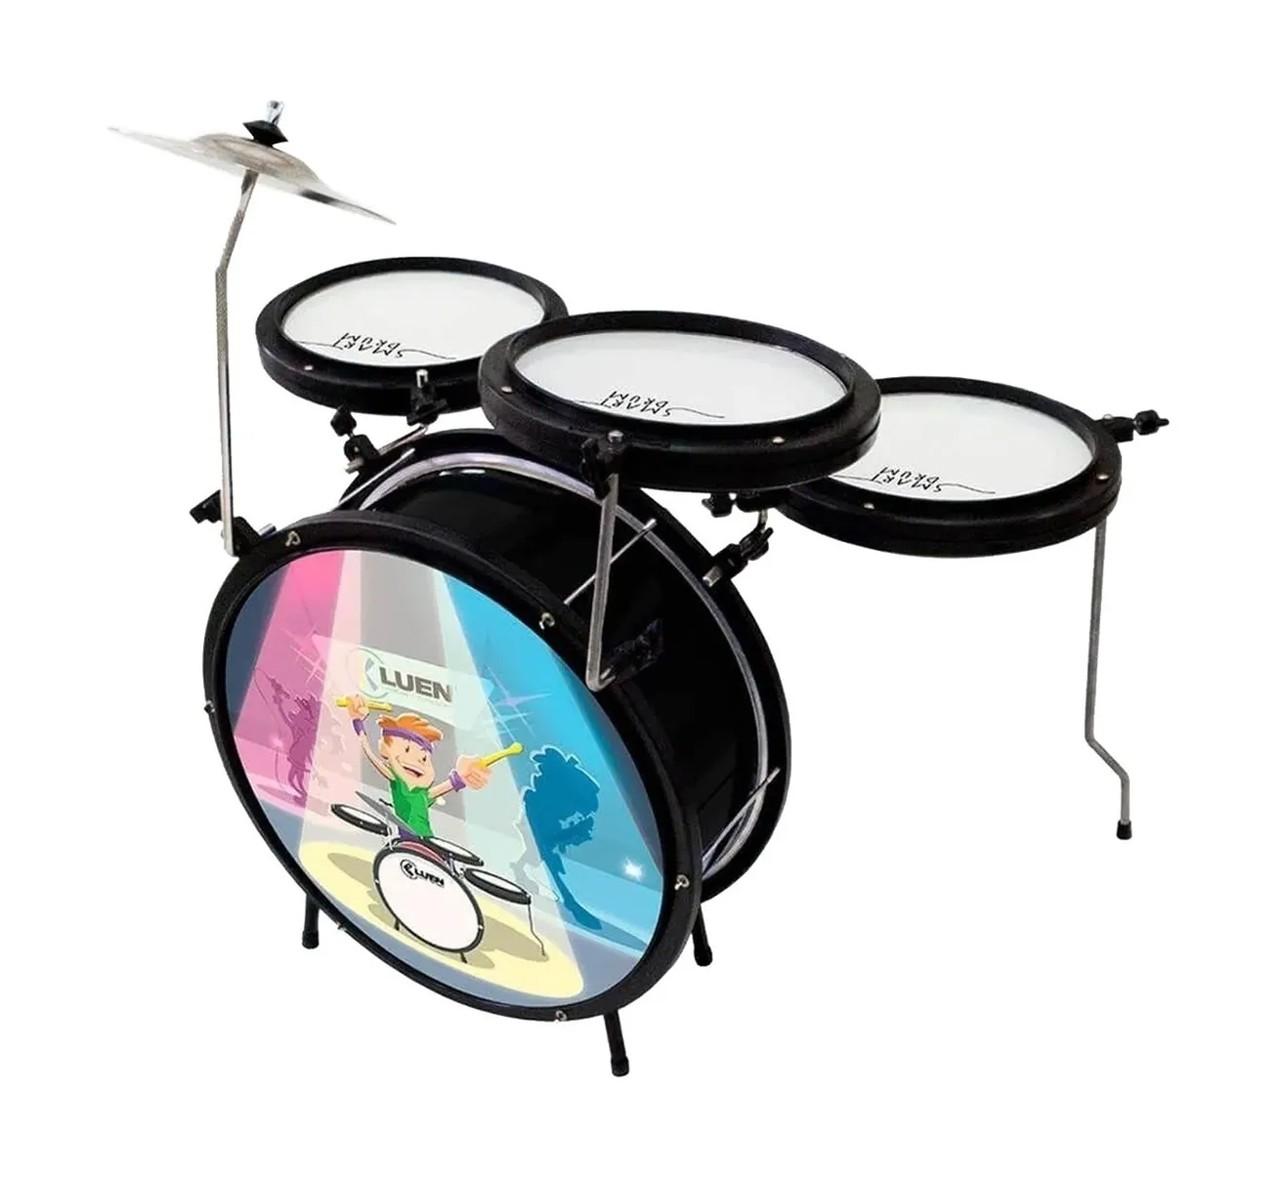 Bateria Luen Infantil Smart Drum Preta 44007PT  - MegaLojaSP